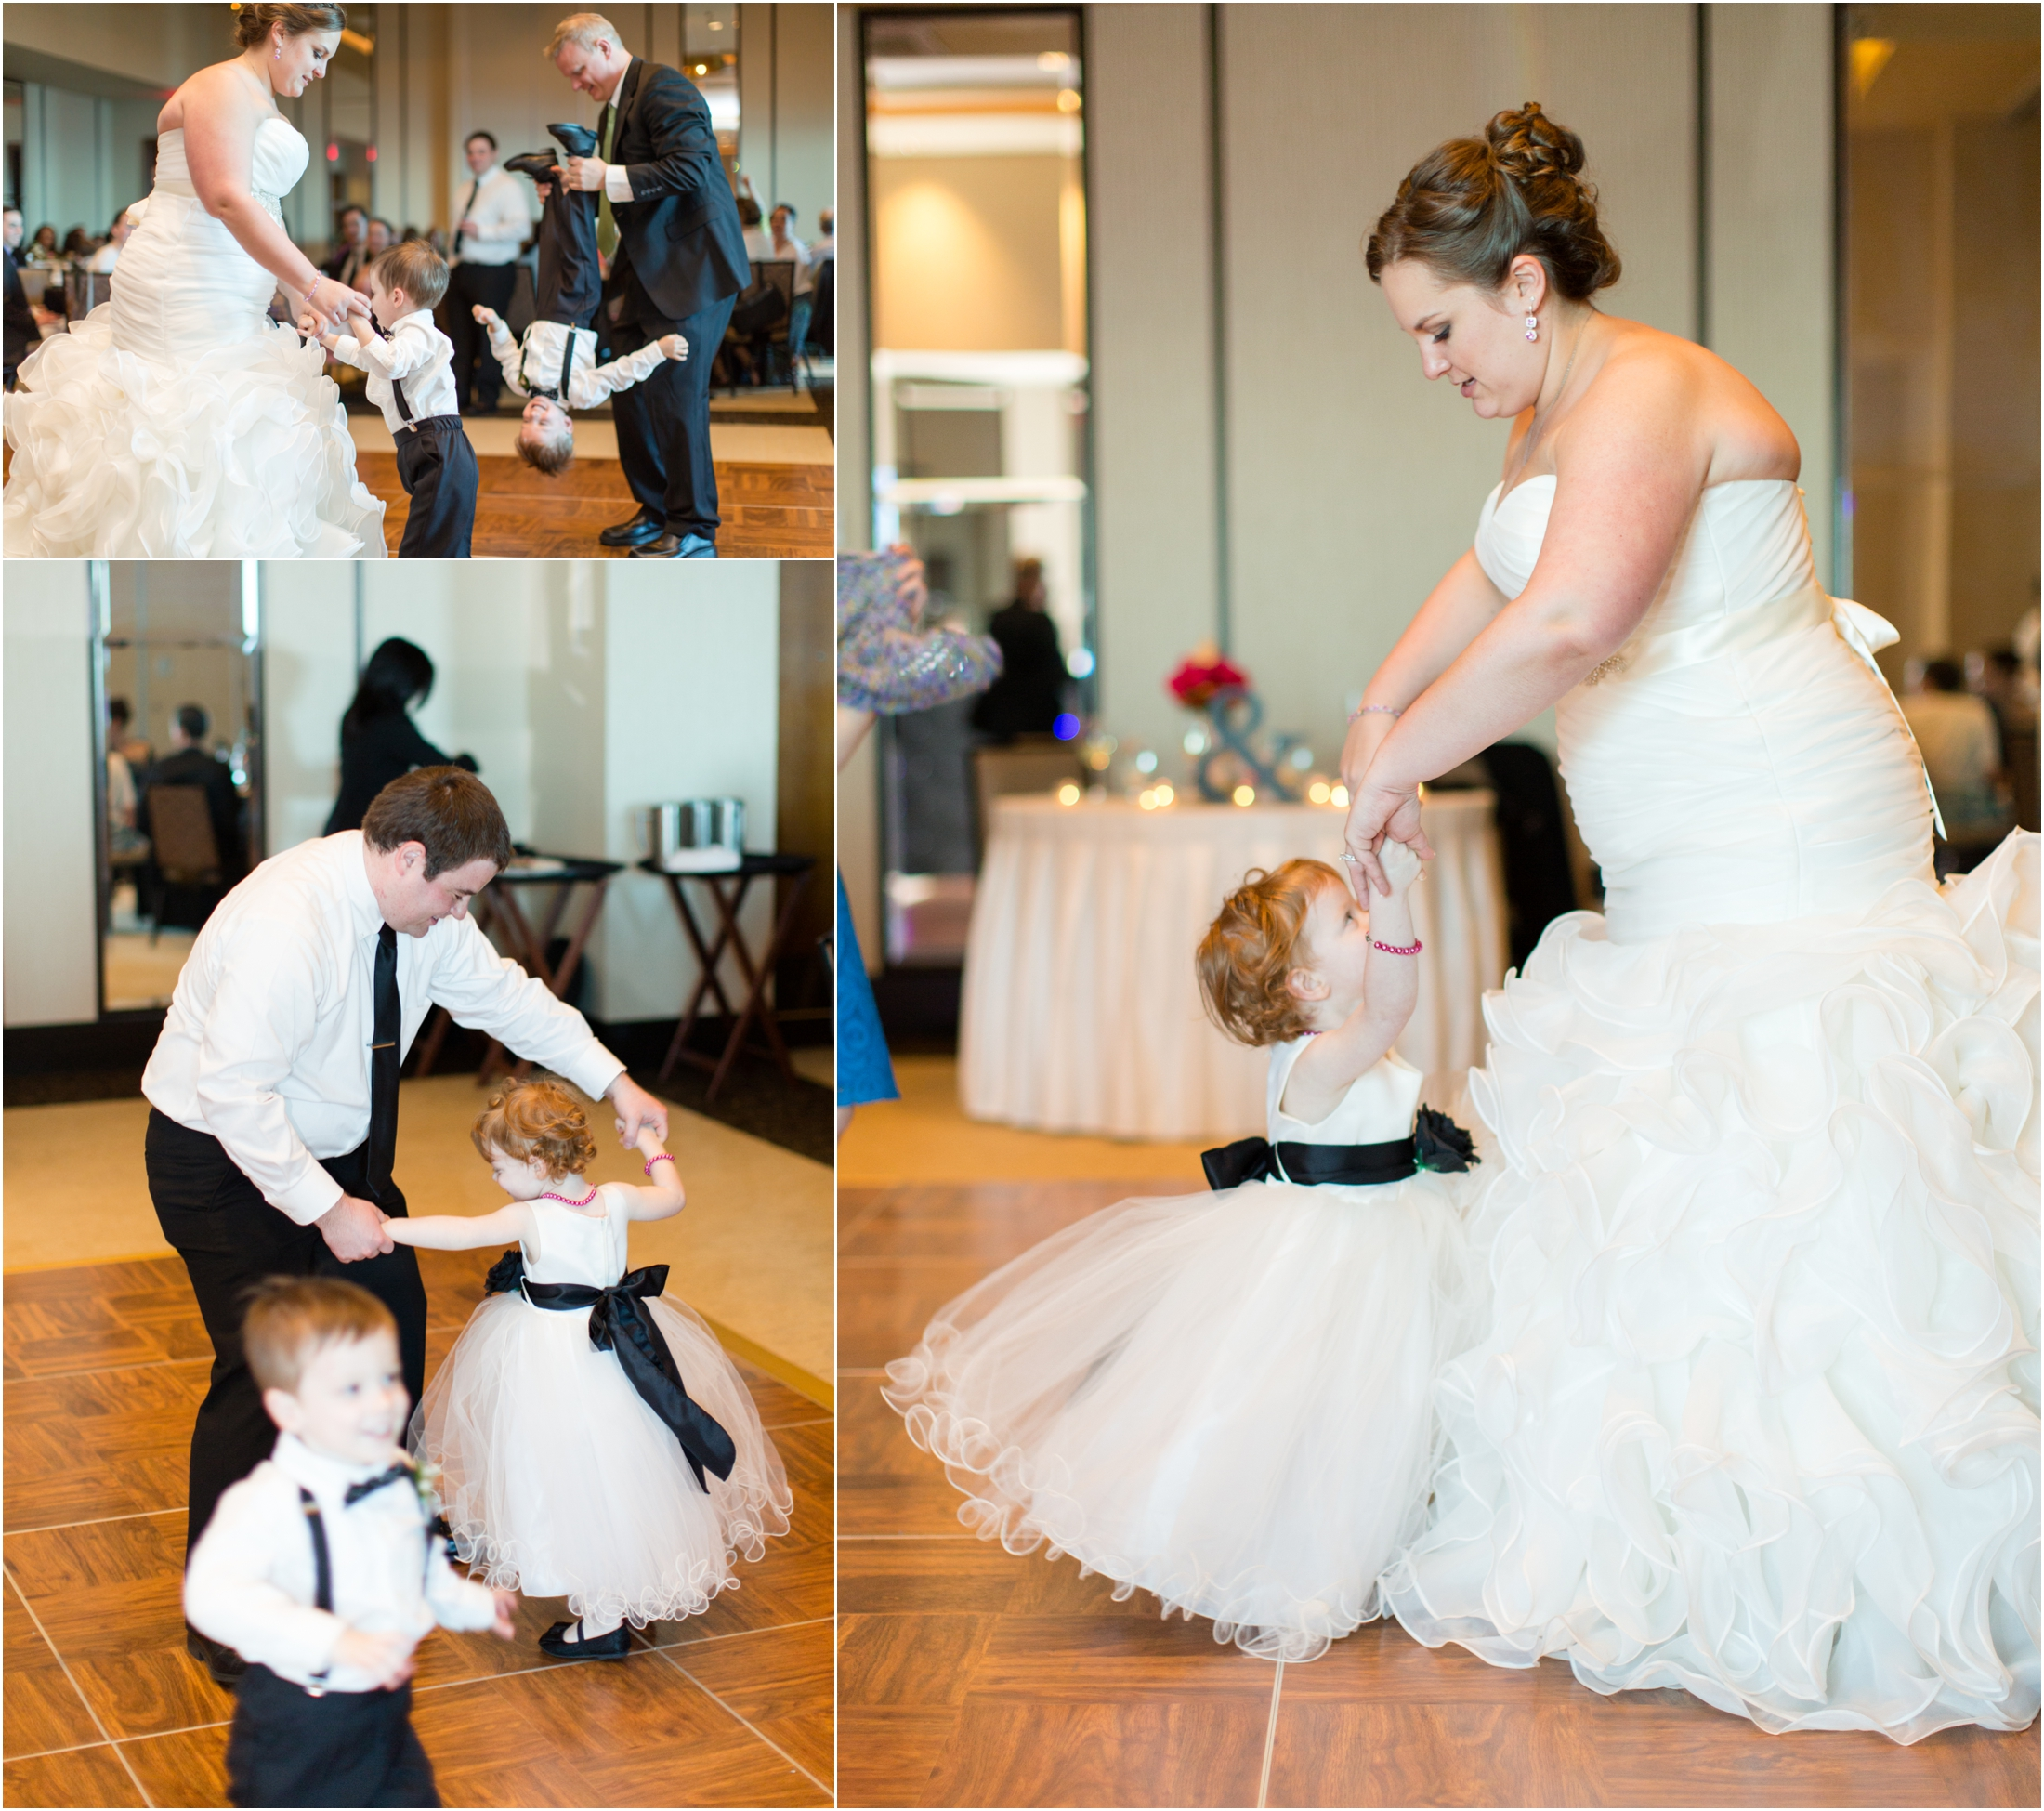 6-Lambert-Wedding-Reception-183.jpg